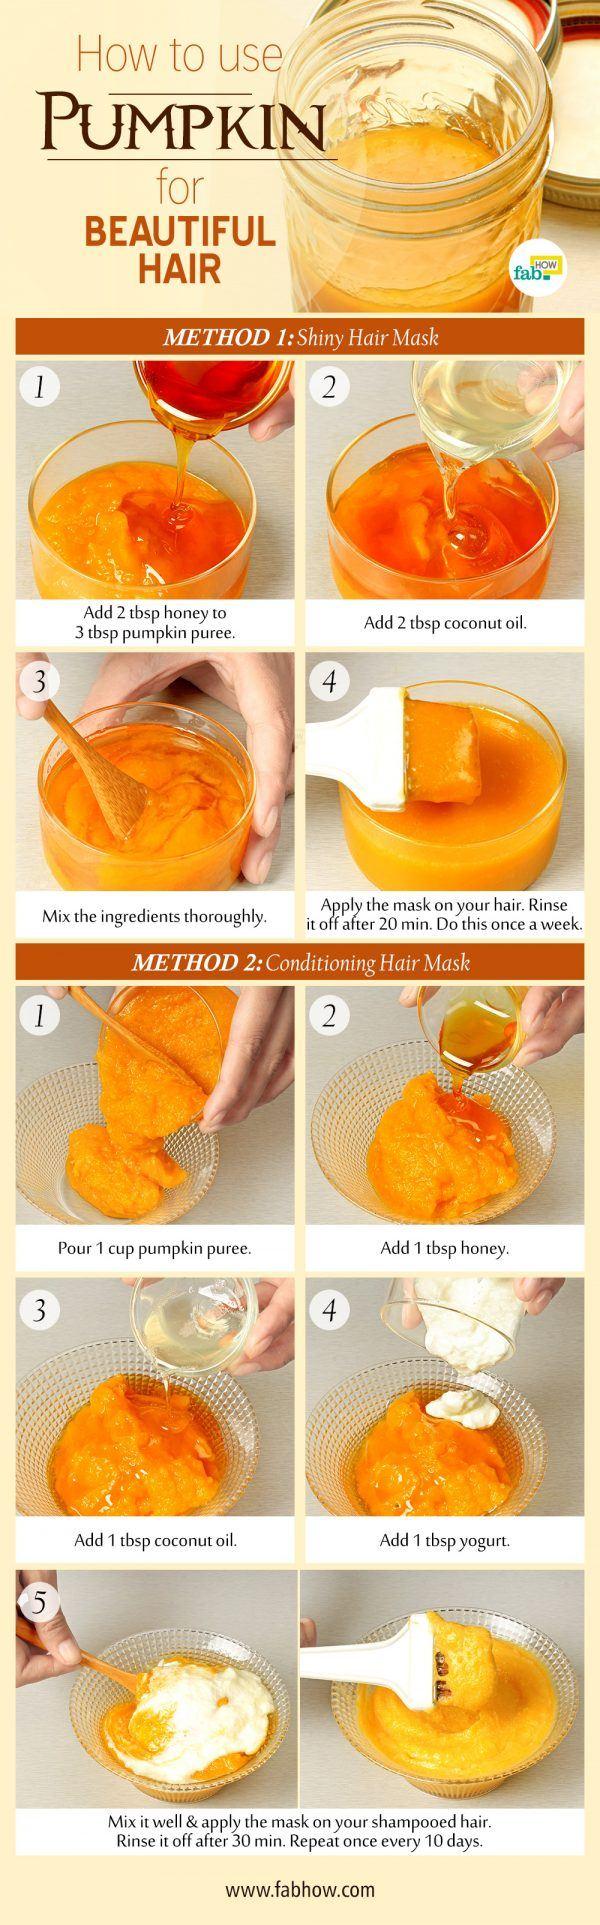 use pumpkin for beautiful hair